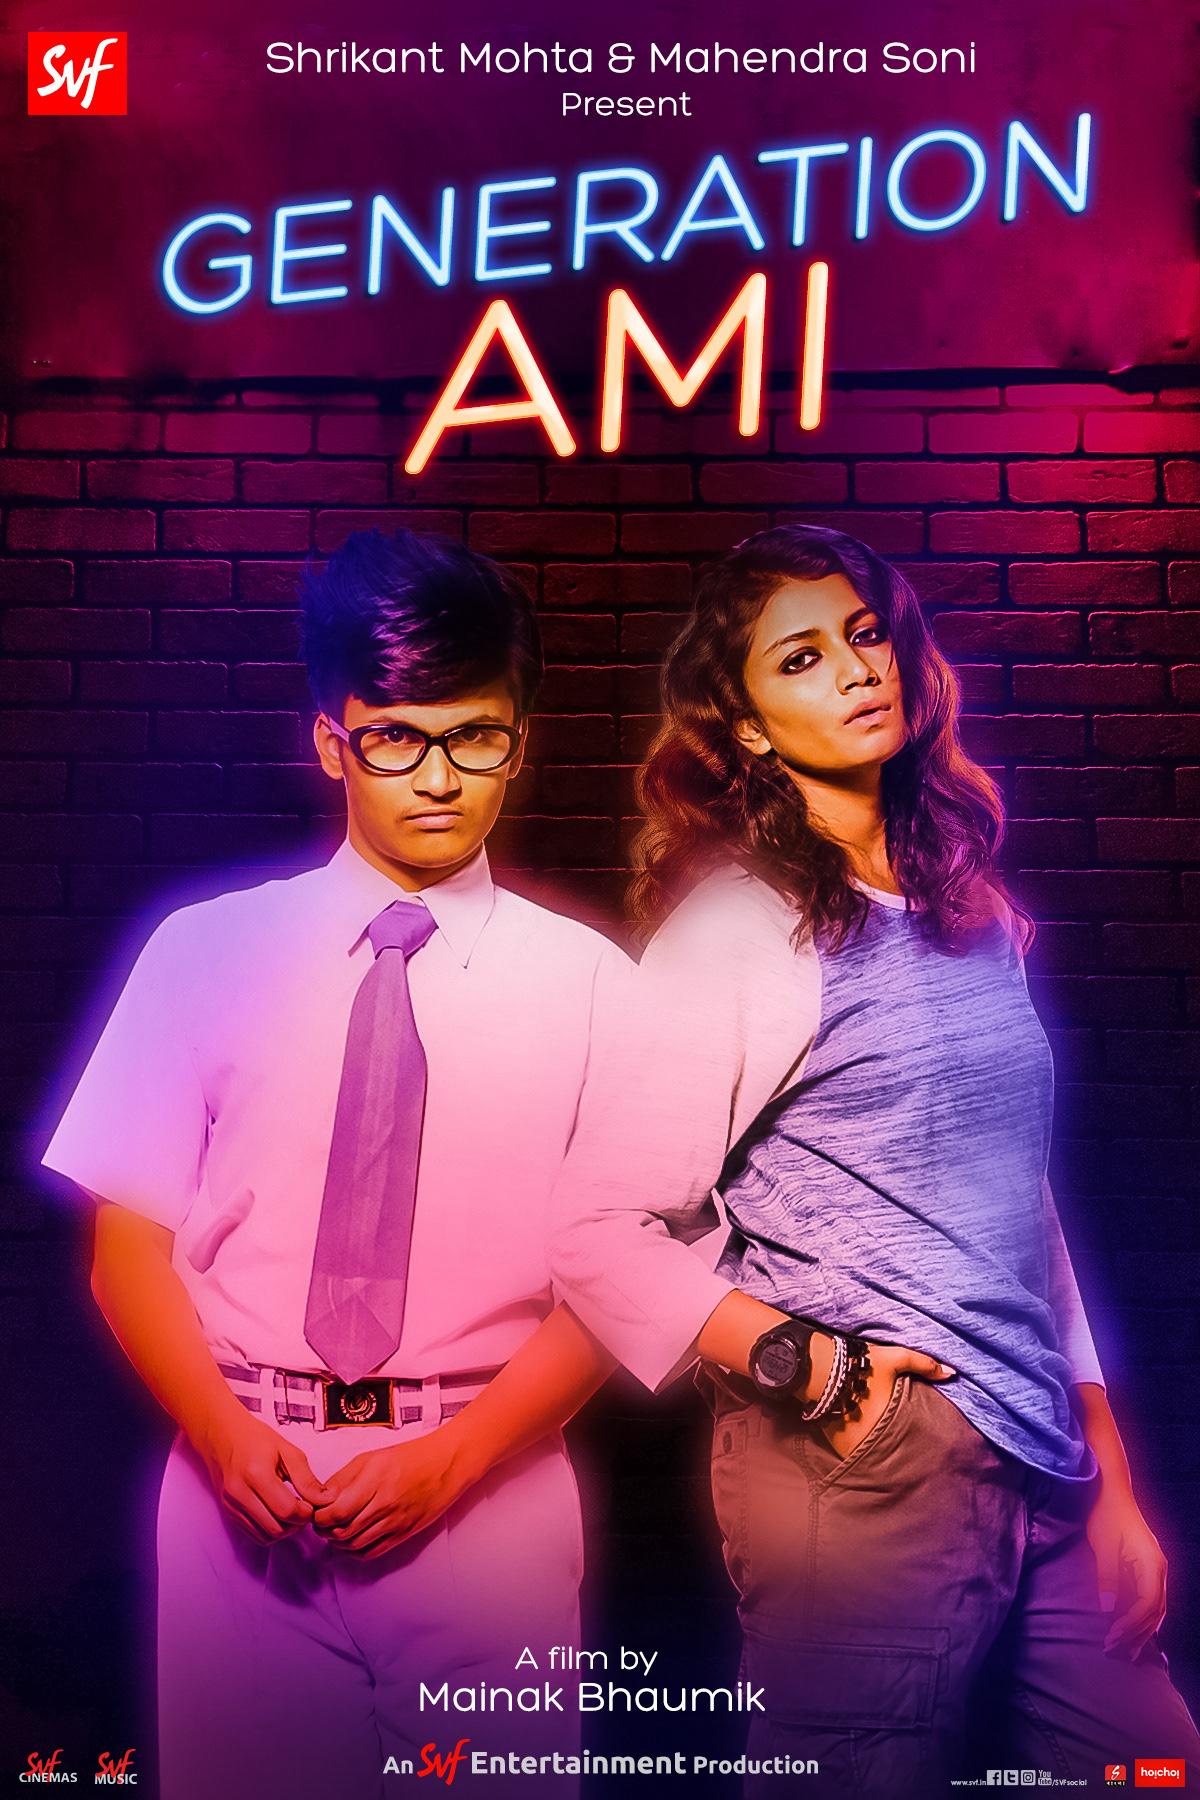 Sauraseni Maitra and Rwitobroto Mukherjee in Generation Aami (2018)